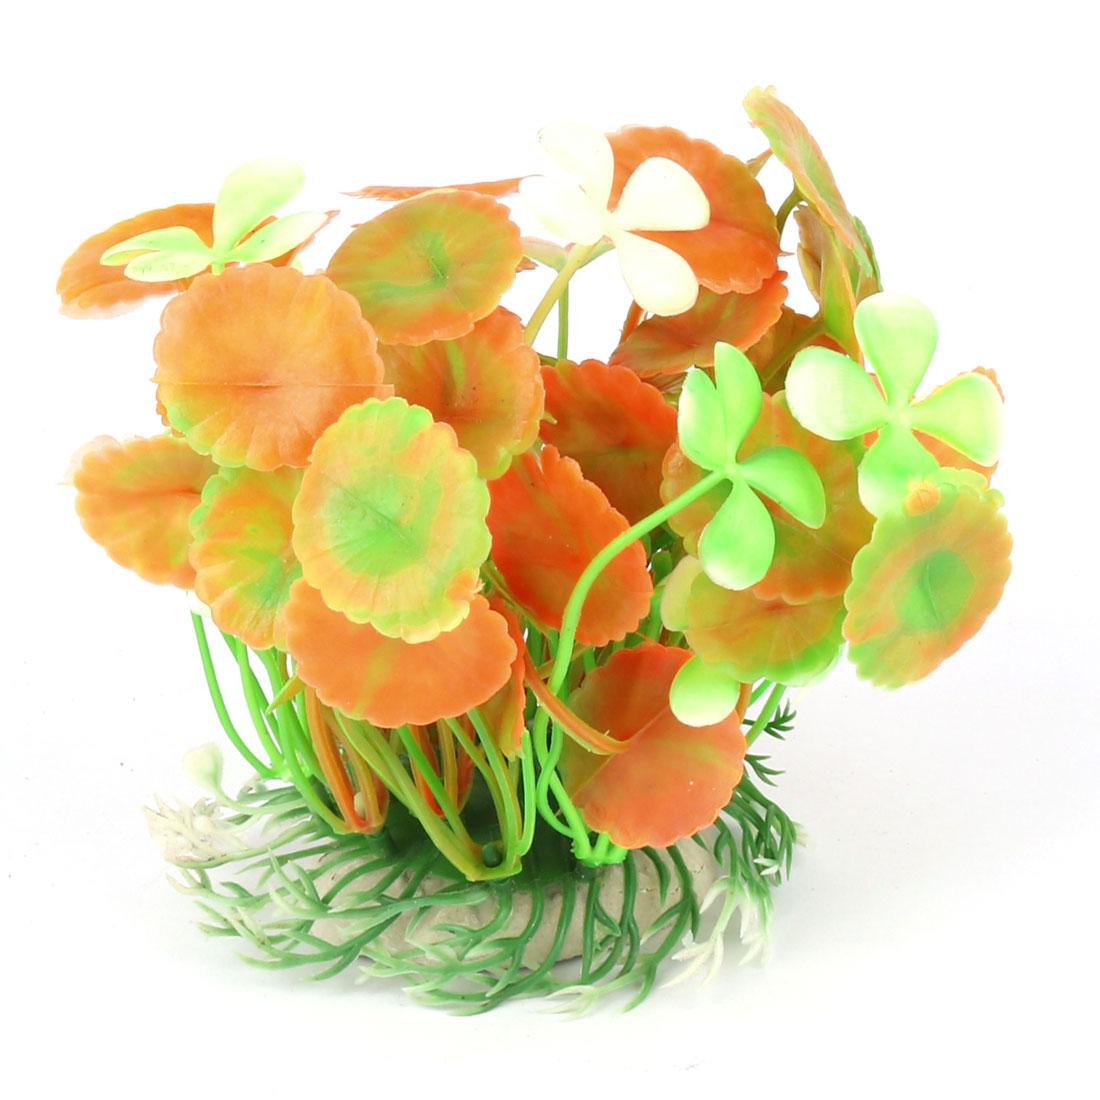 Aquarium Fish Tank Plastic Artificial Plant Grass Decoration Light Green Orange 11cm High